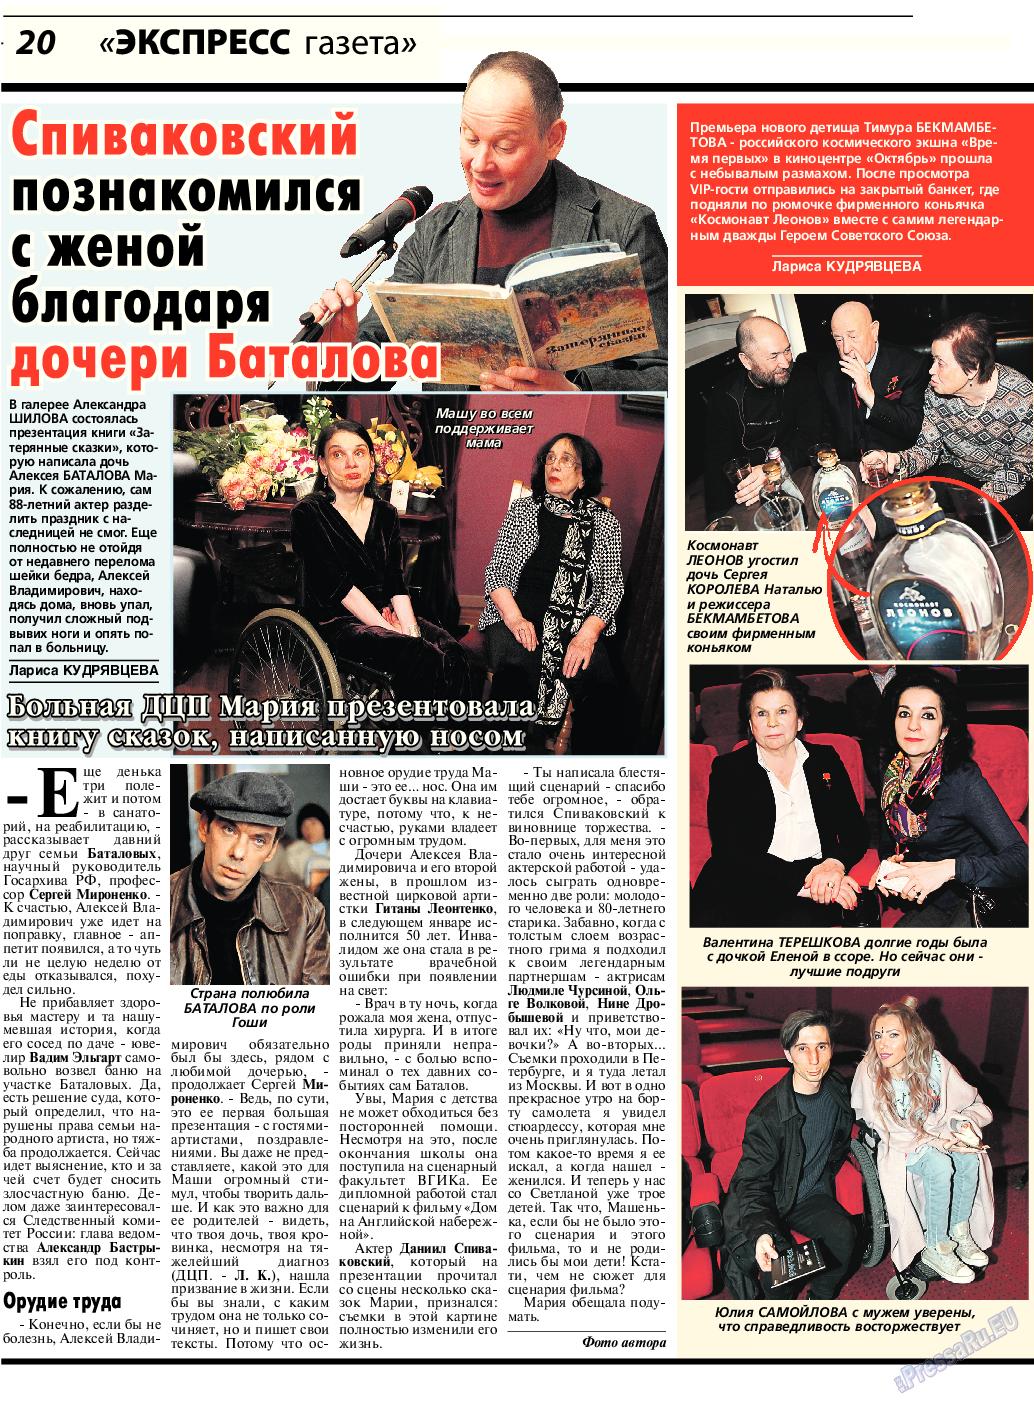 Экспресс газета (газета). 2017 год, номер 5, стр. 20